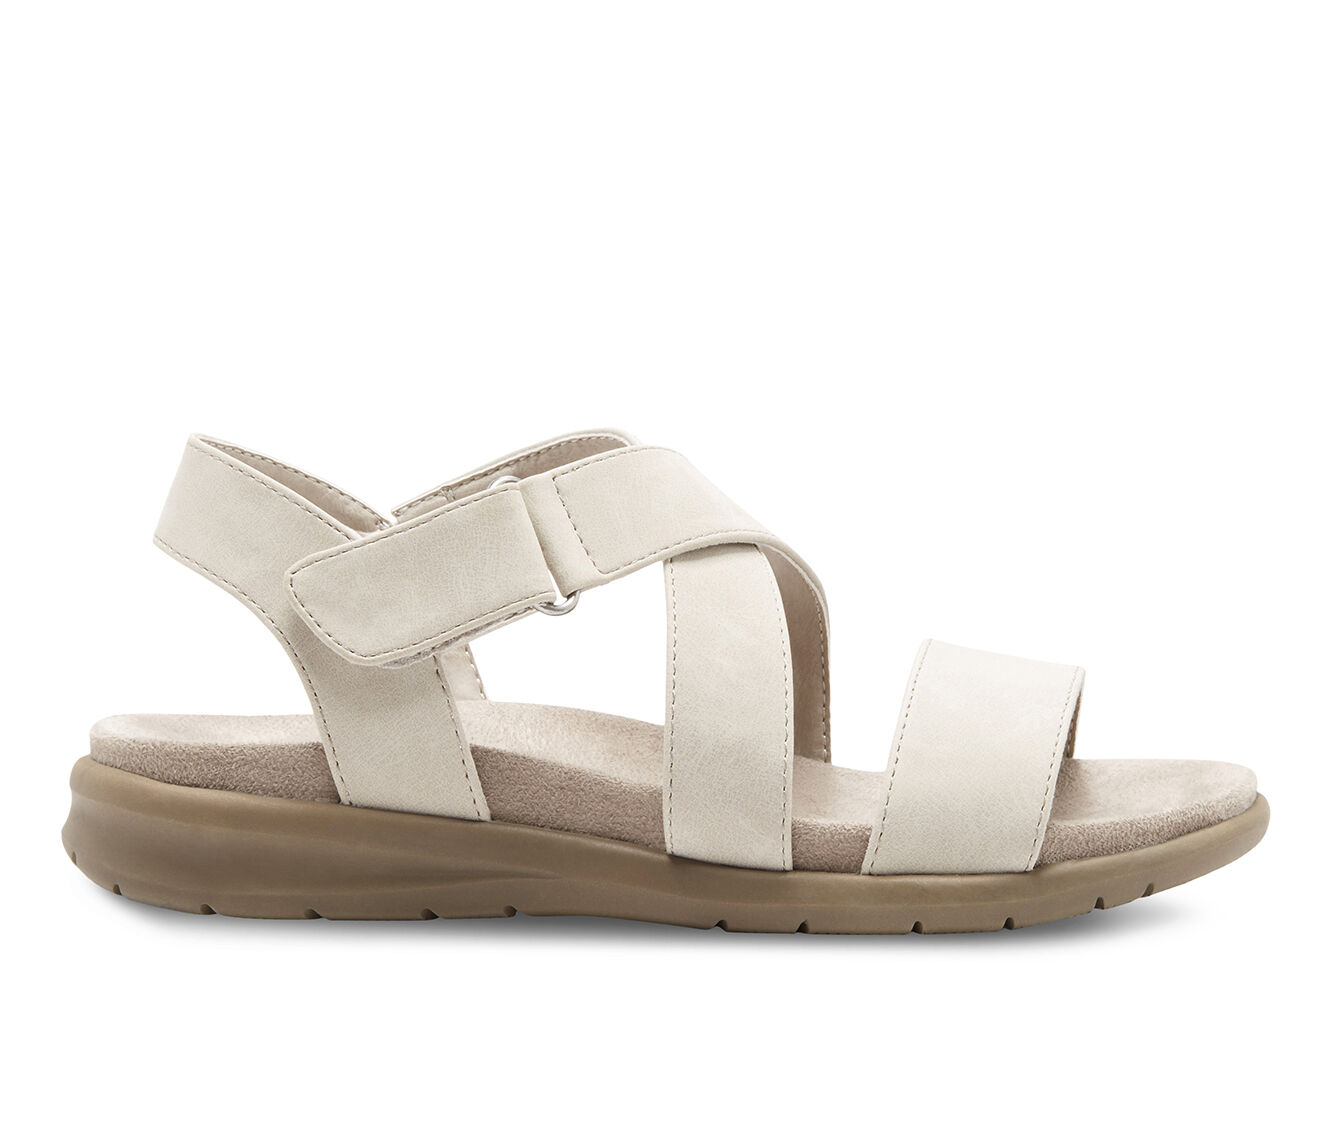 find authentic Women's Eastland Cilla Sandals Stone